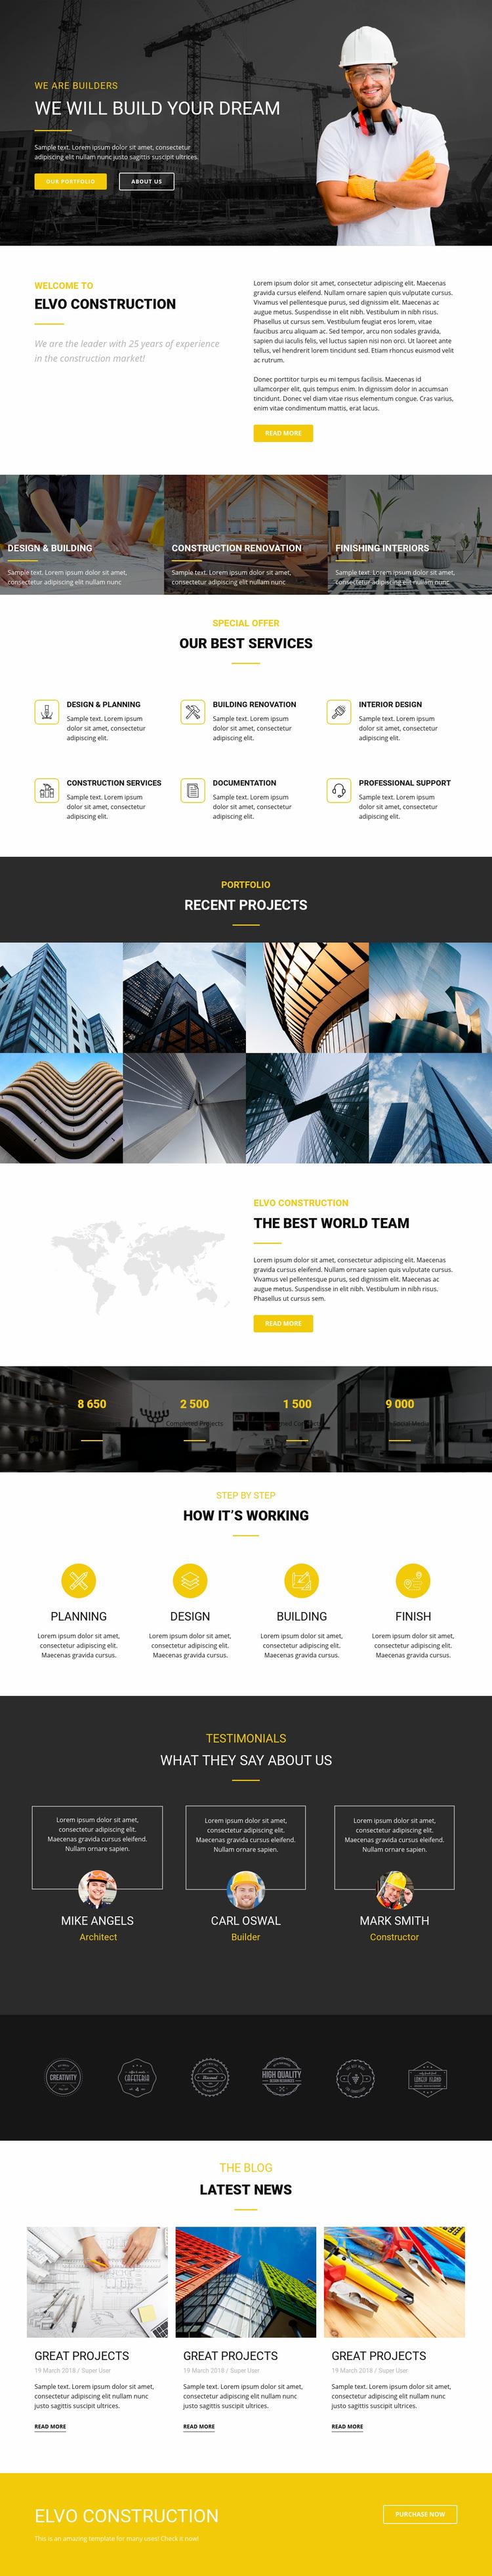 Build your dream industrial Web Page Designer